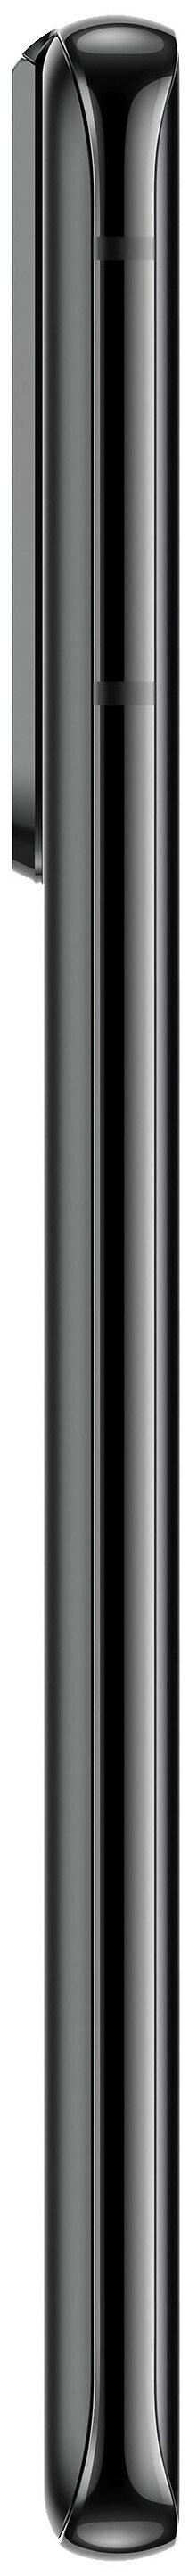 Samsung Galaxy S21 Ultra 5G 12/128GB - SIM-карты: 2 (nano SIM+eSIM)